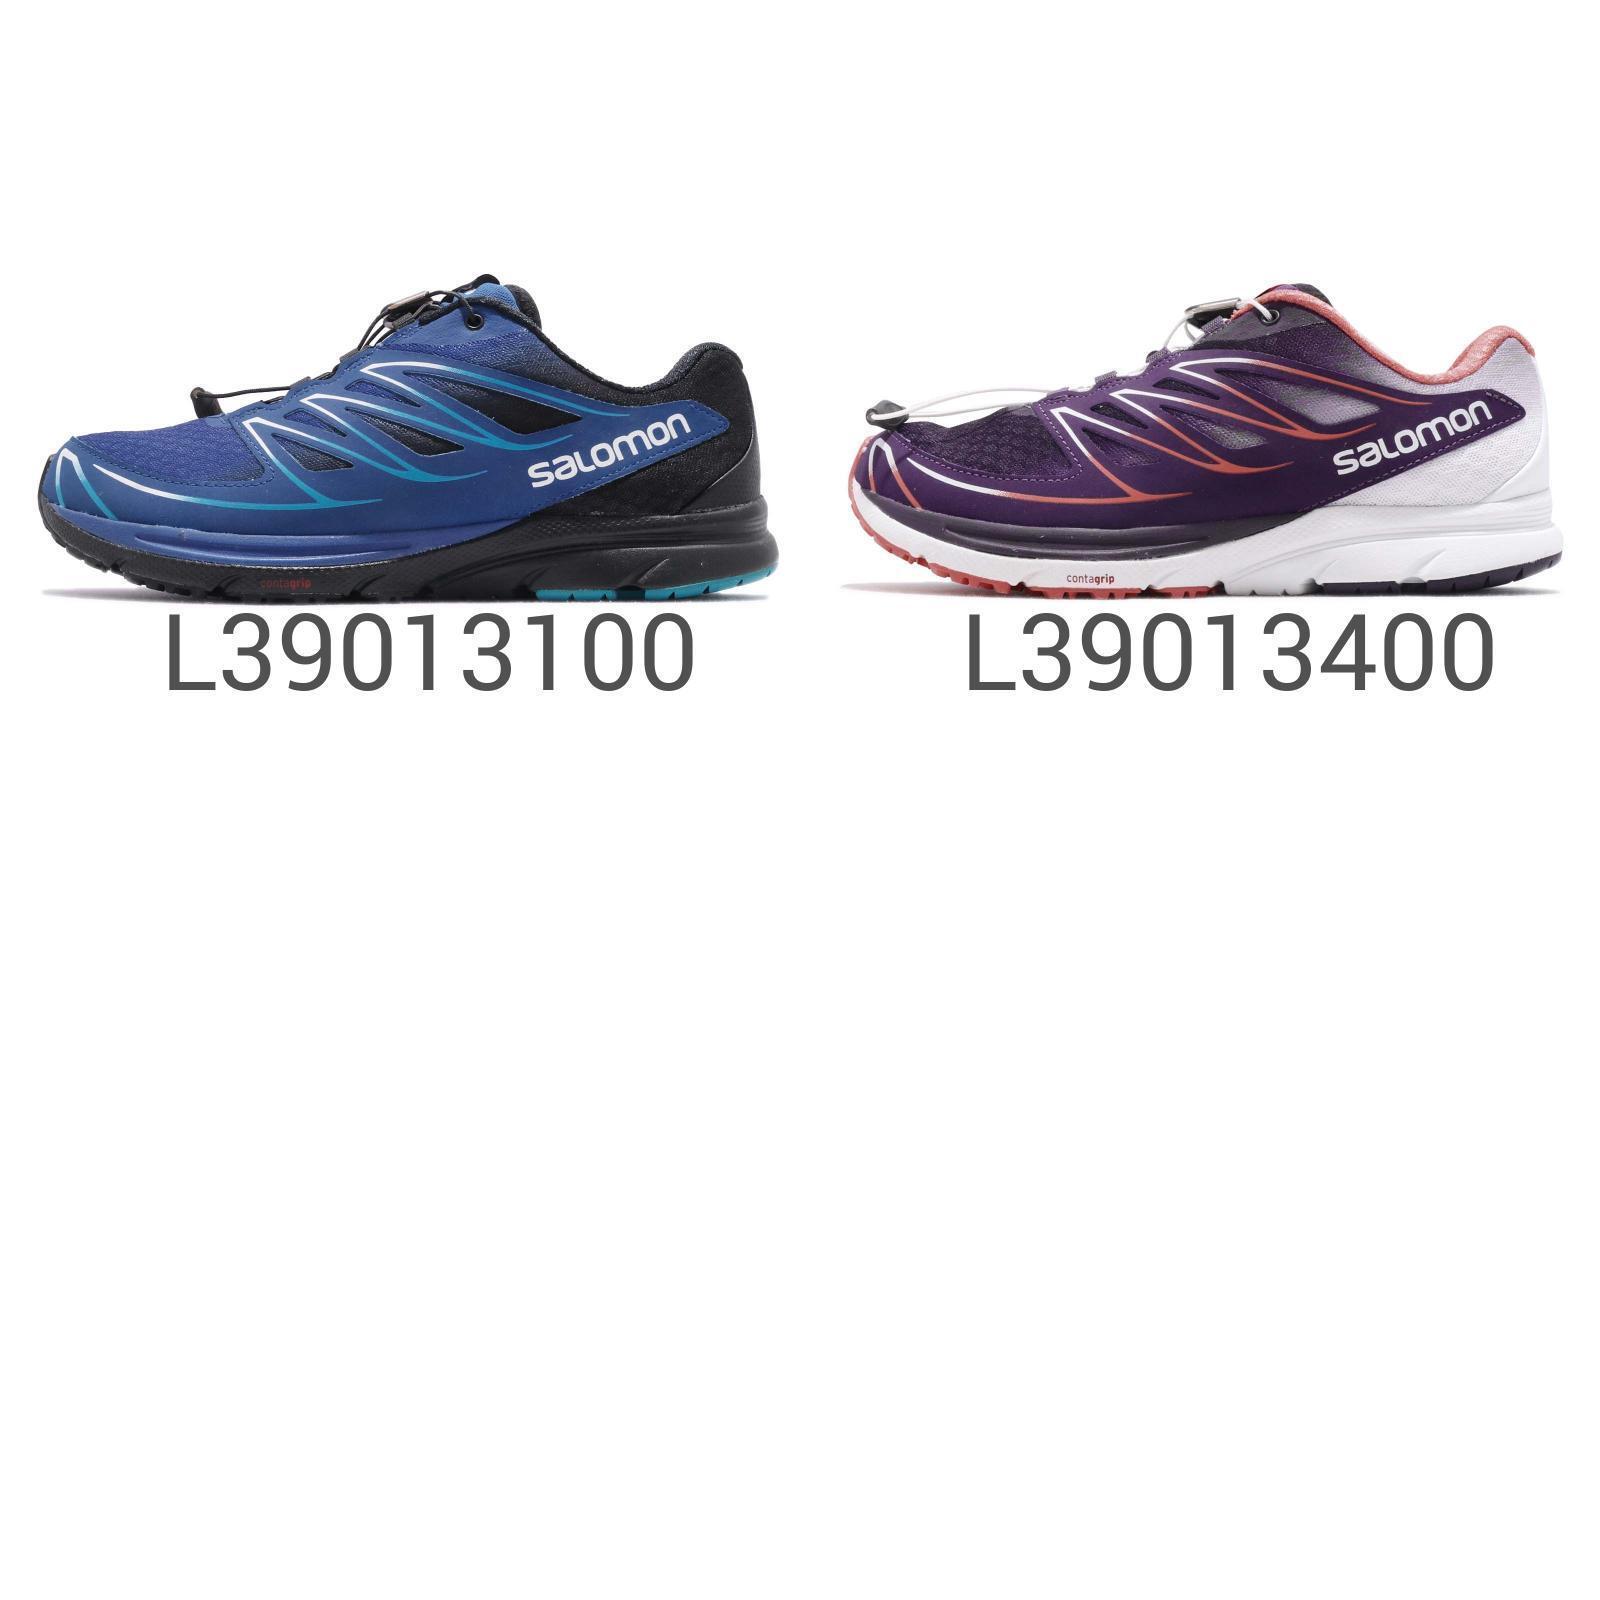 Salomon Sense Mantra 3 Men Women Outdoor Trail Running shoes Pick 1